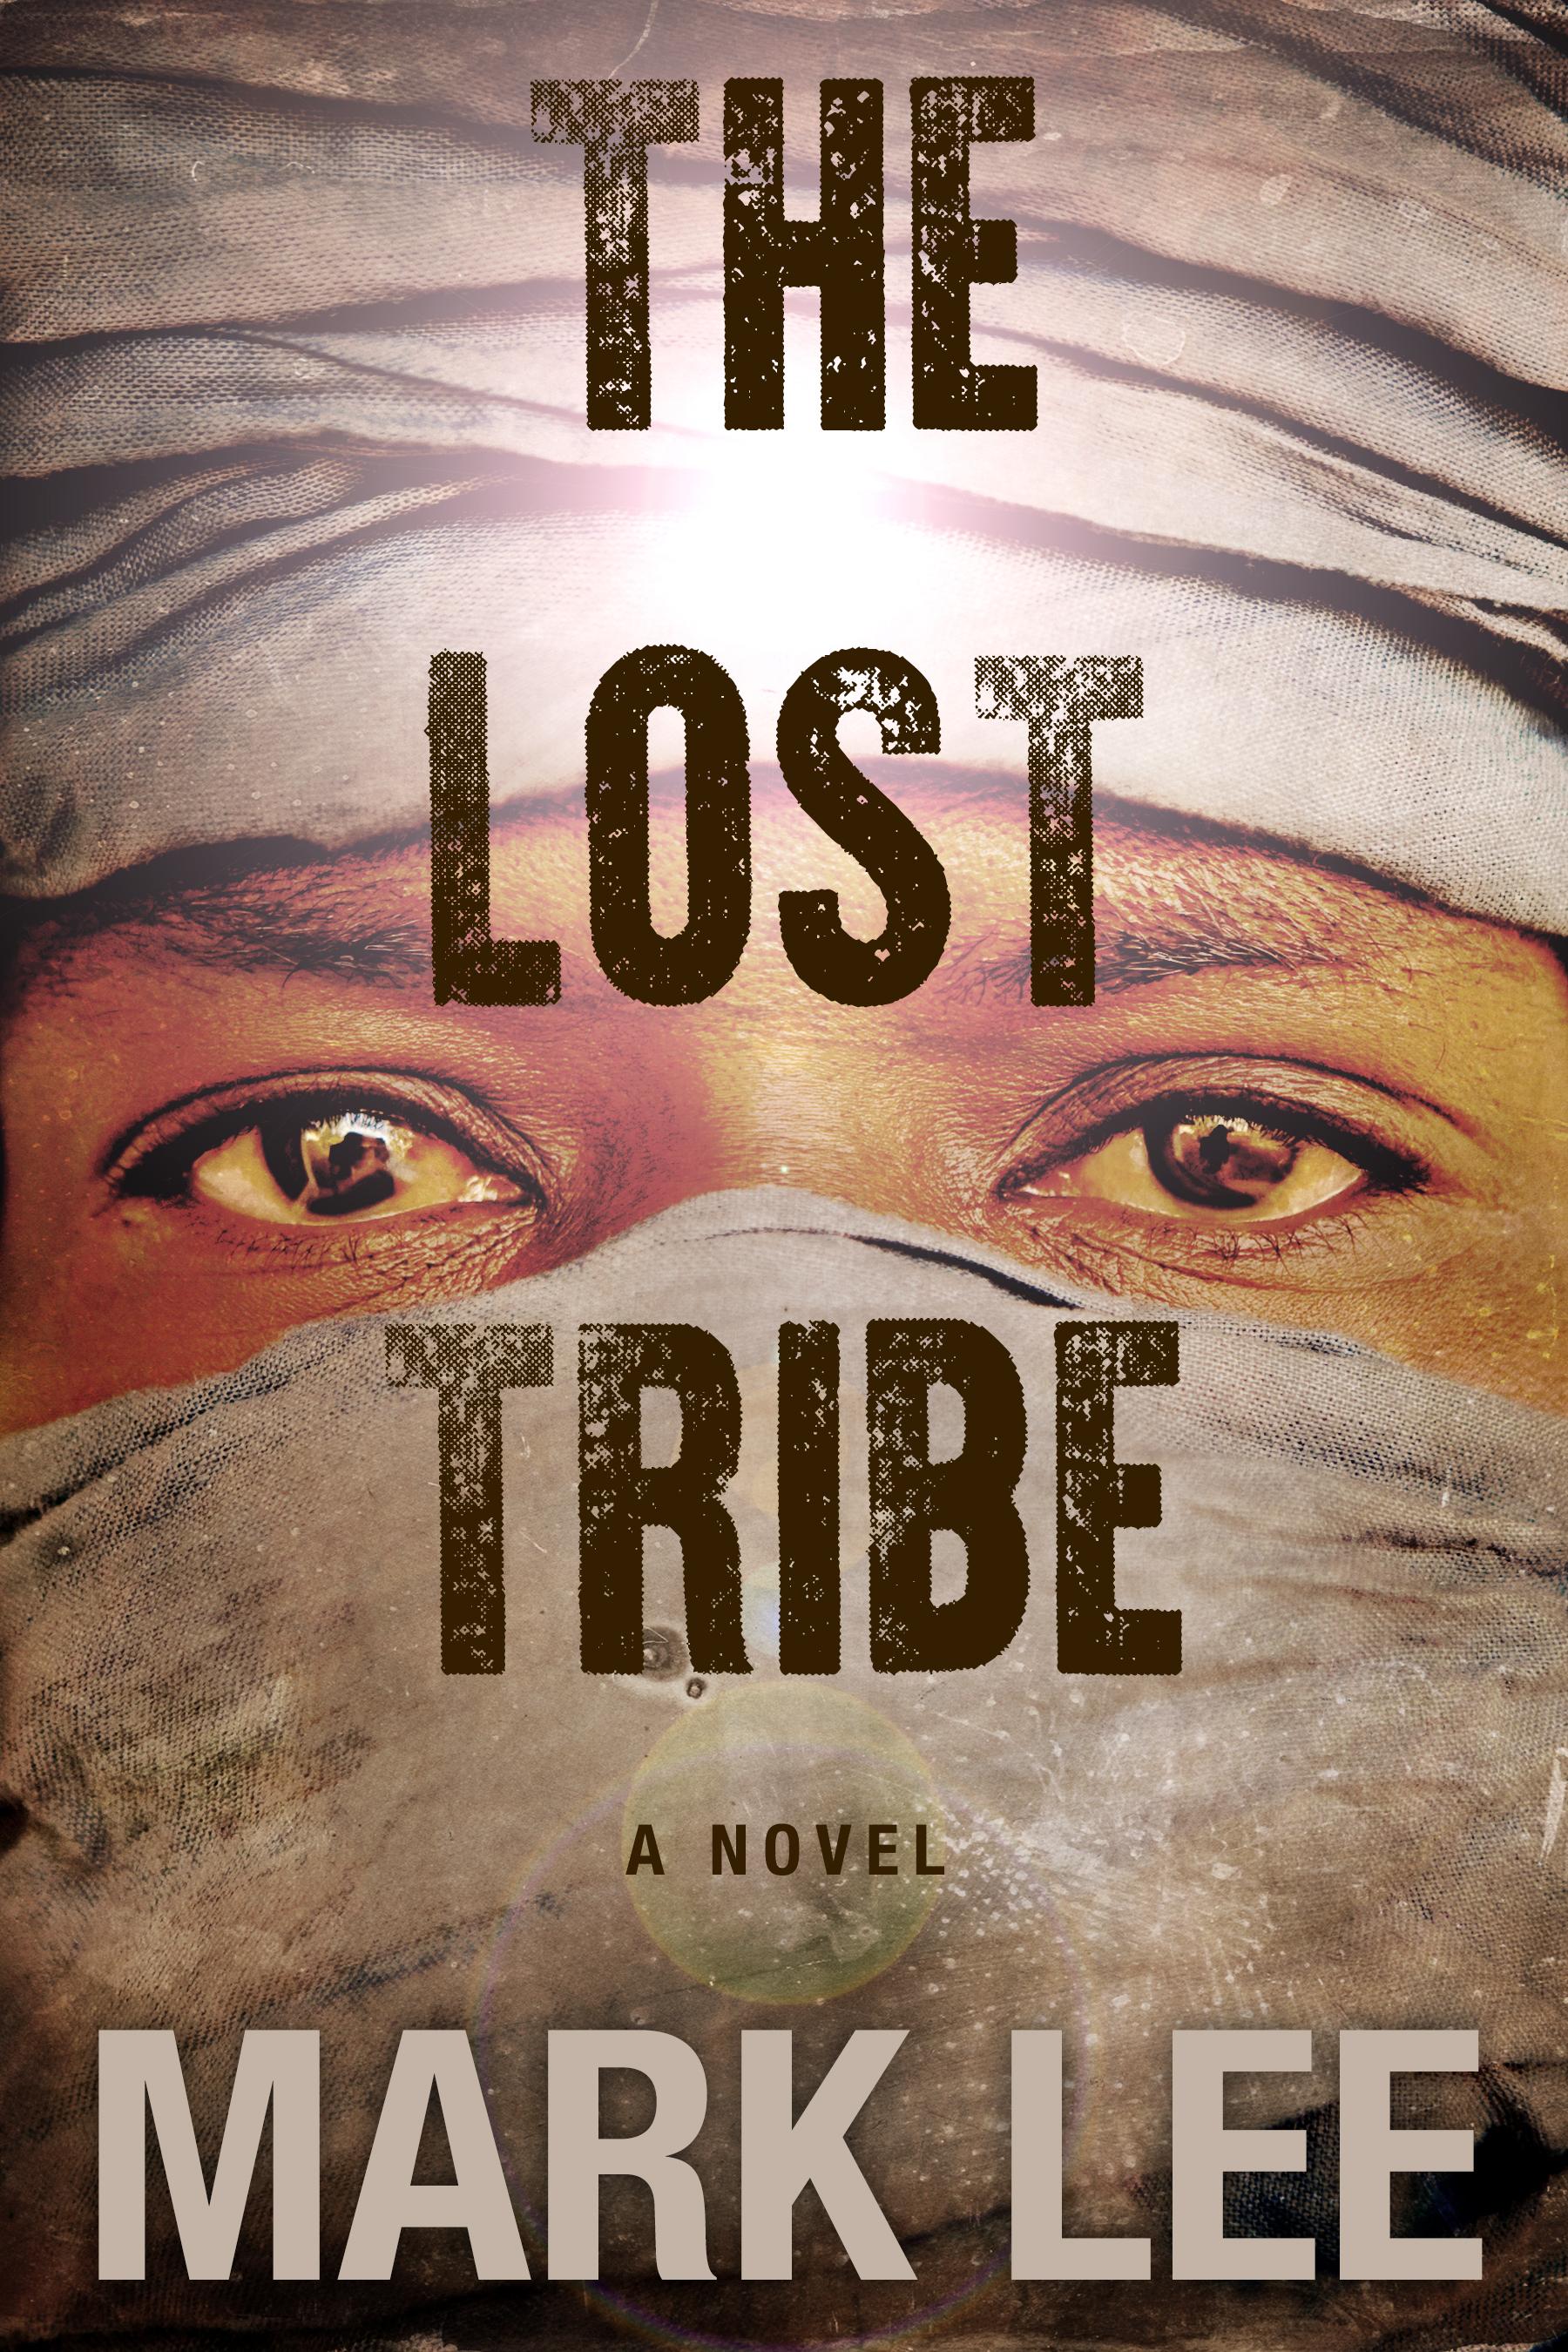 The Lost Tribe_300dpi.jpg